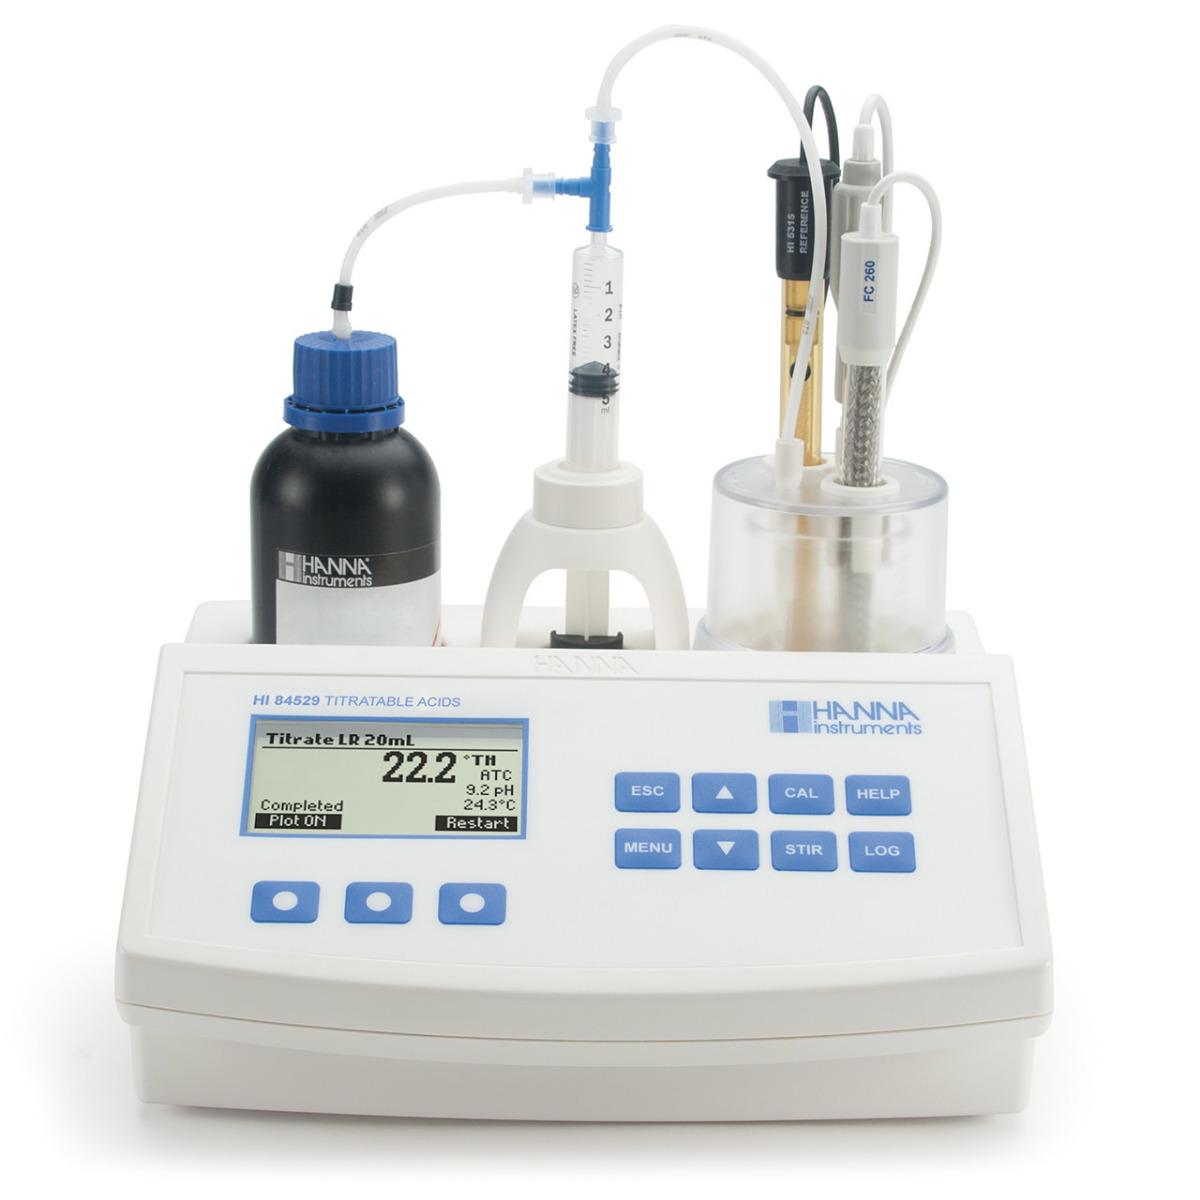 HI84529 Titratable Acidity Mini Titrator for Dairy Analysis